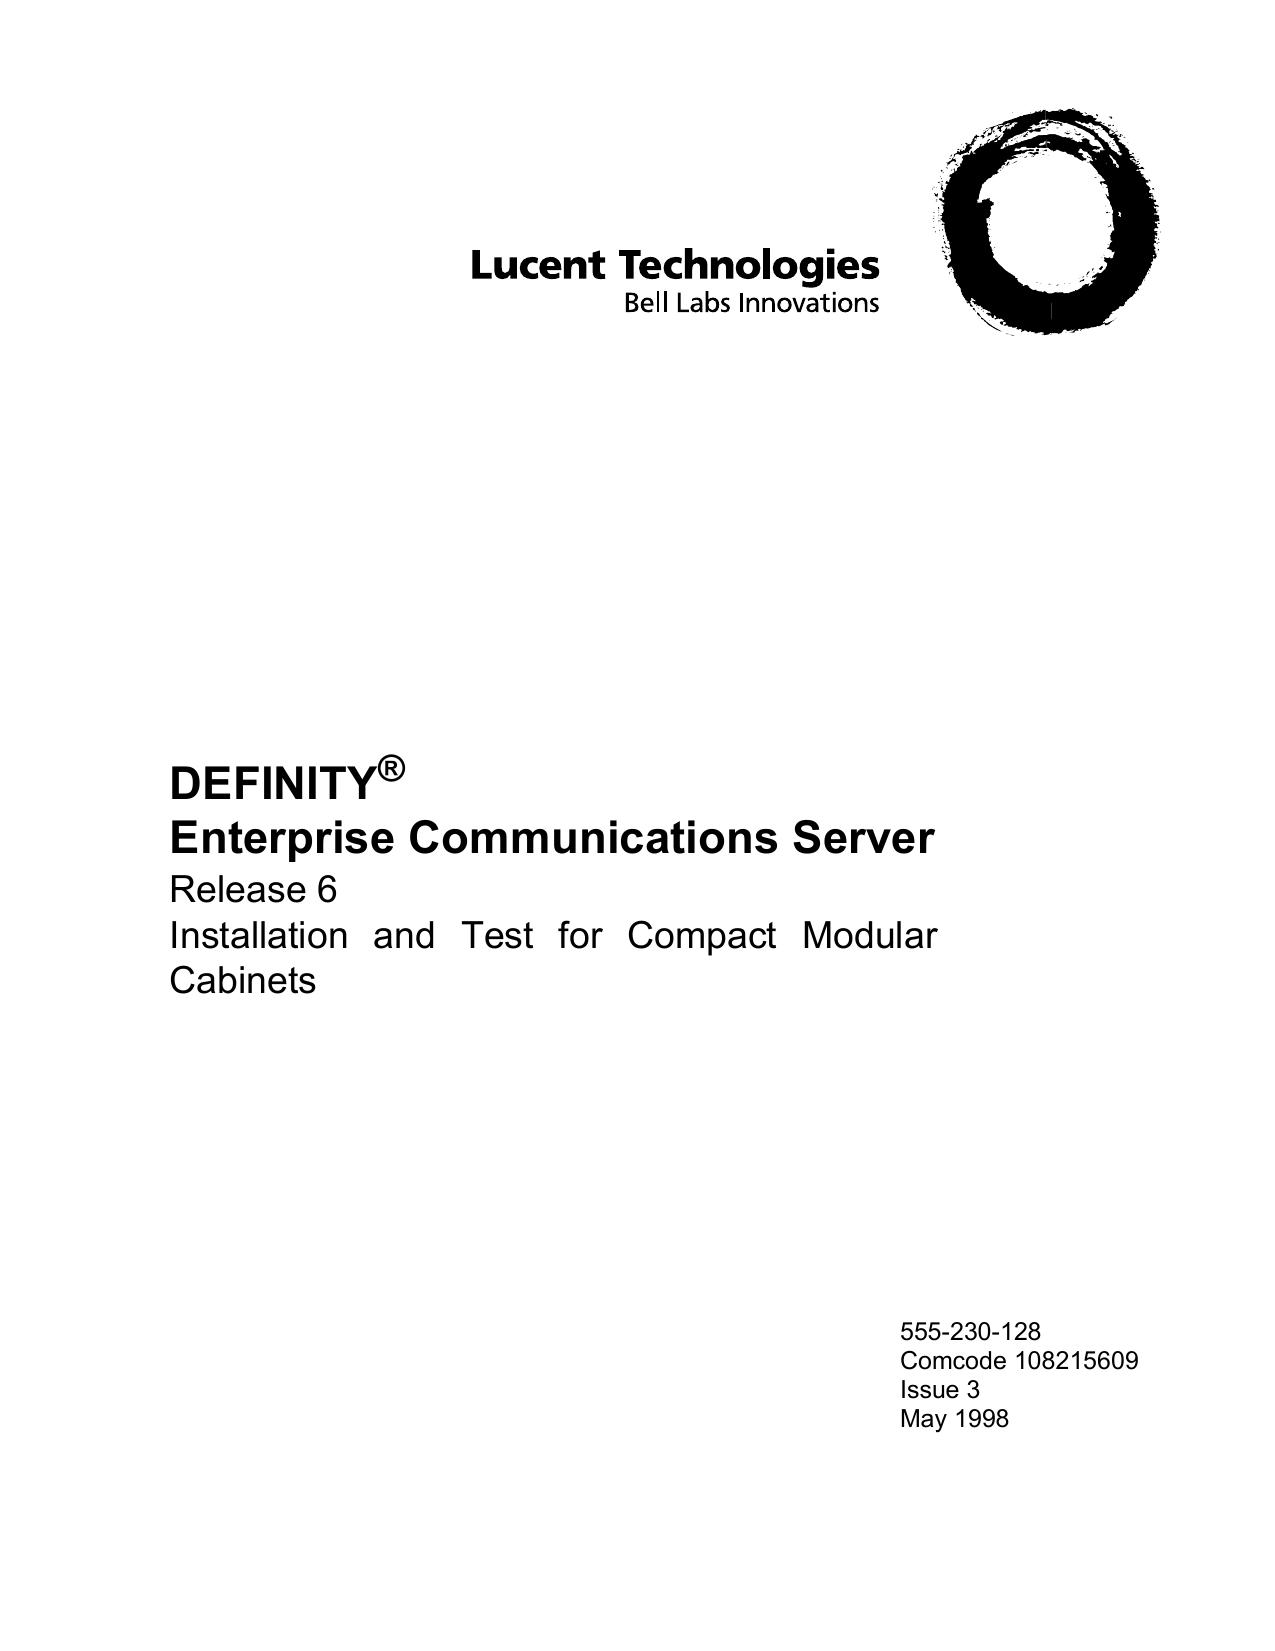 Lucent Technologies Life Jacket 555-230-128 User manual